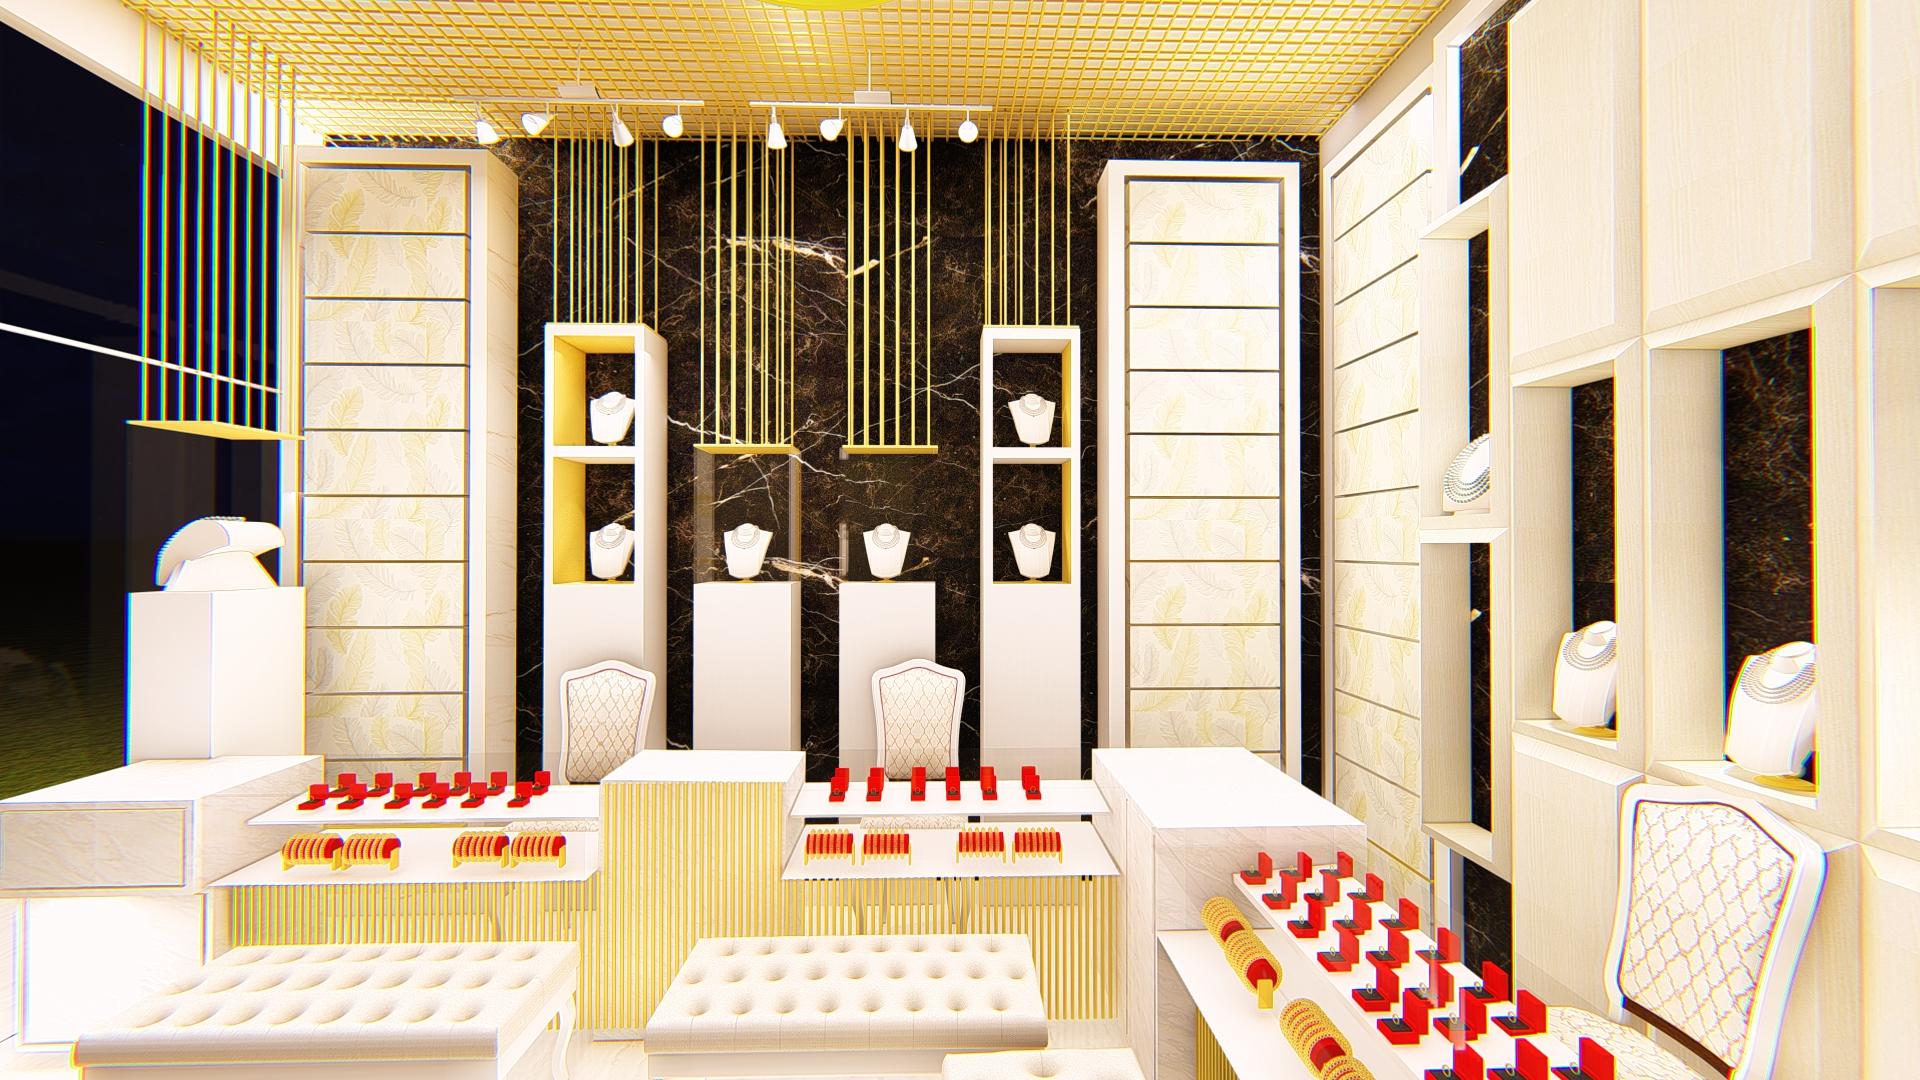 Jewellery store Fatehabad